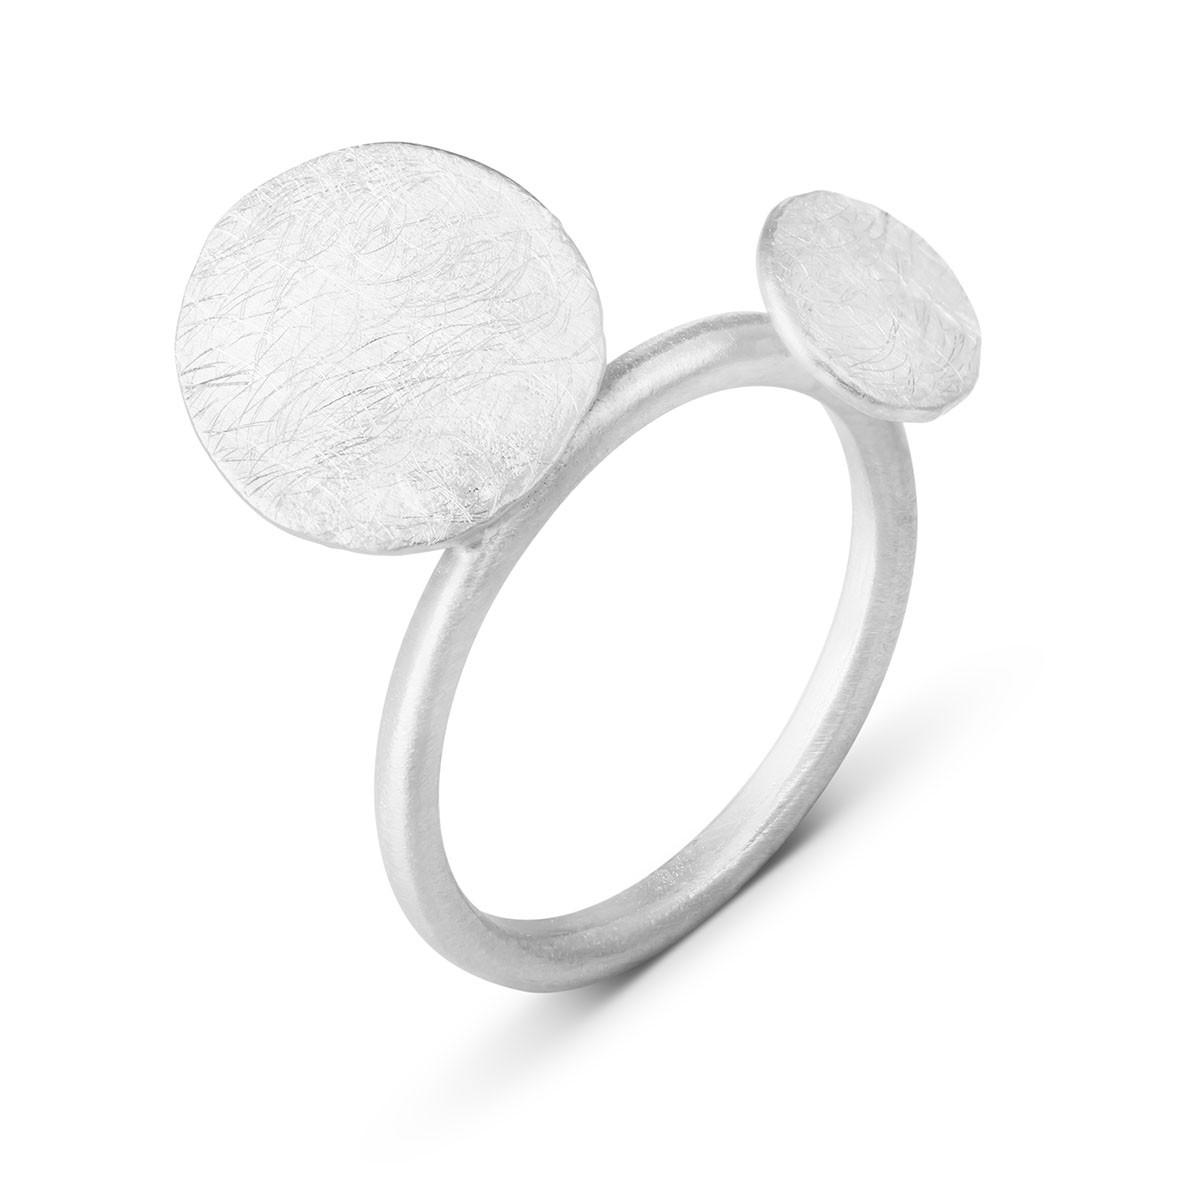 Joidart Flower Bloom Silver Ring Size 7